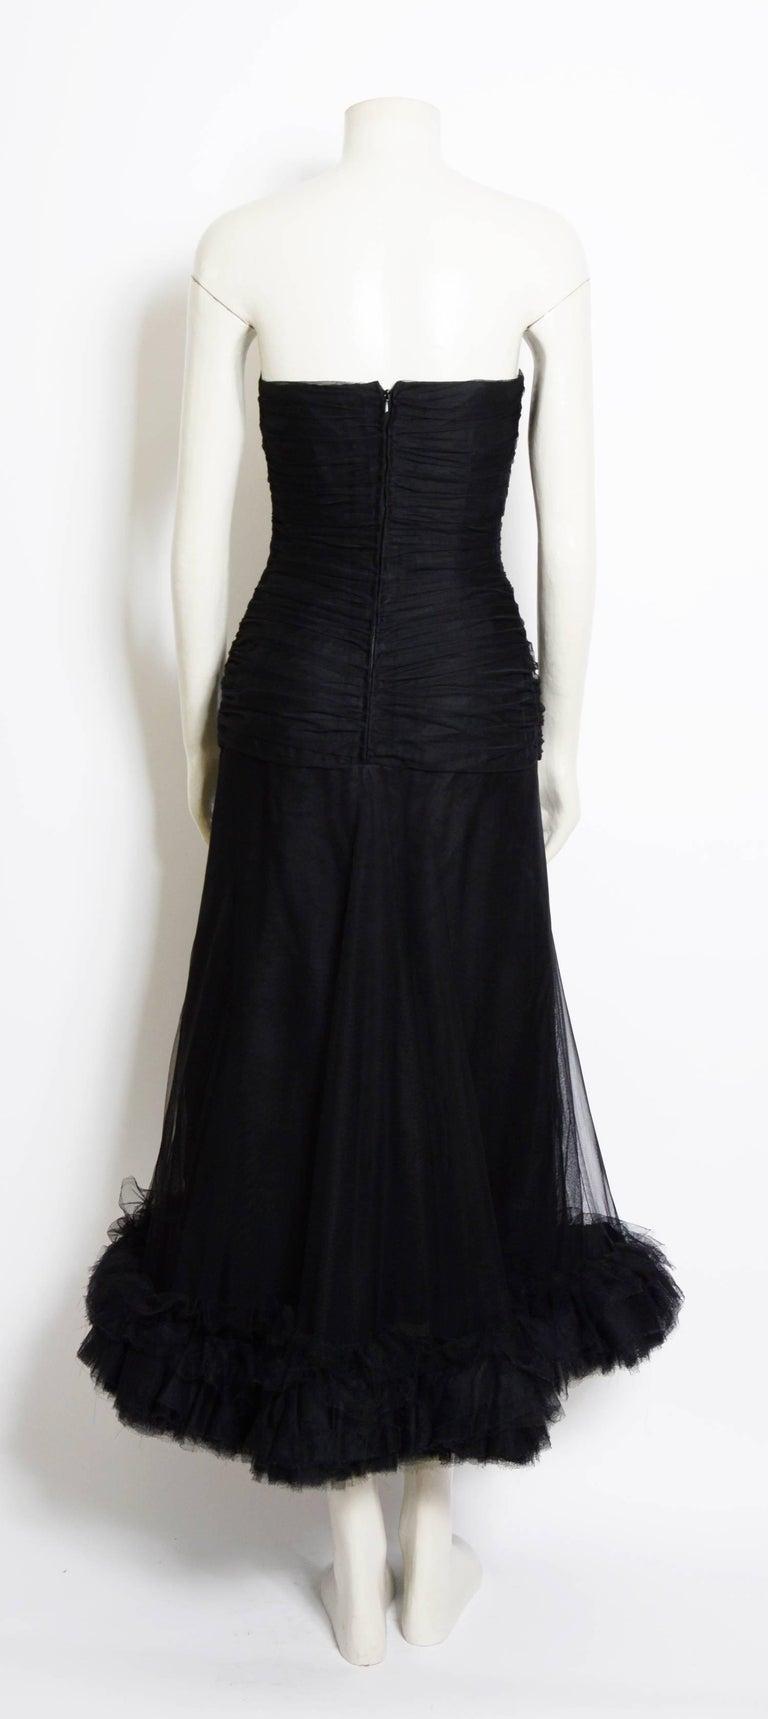 Christian Dior Vintage Black Tulle Silk Ruched Bustier